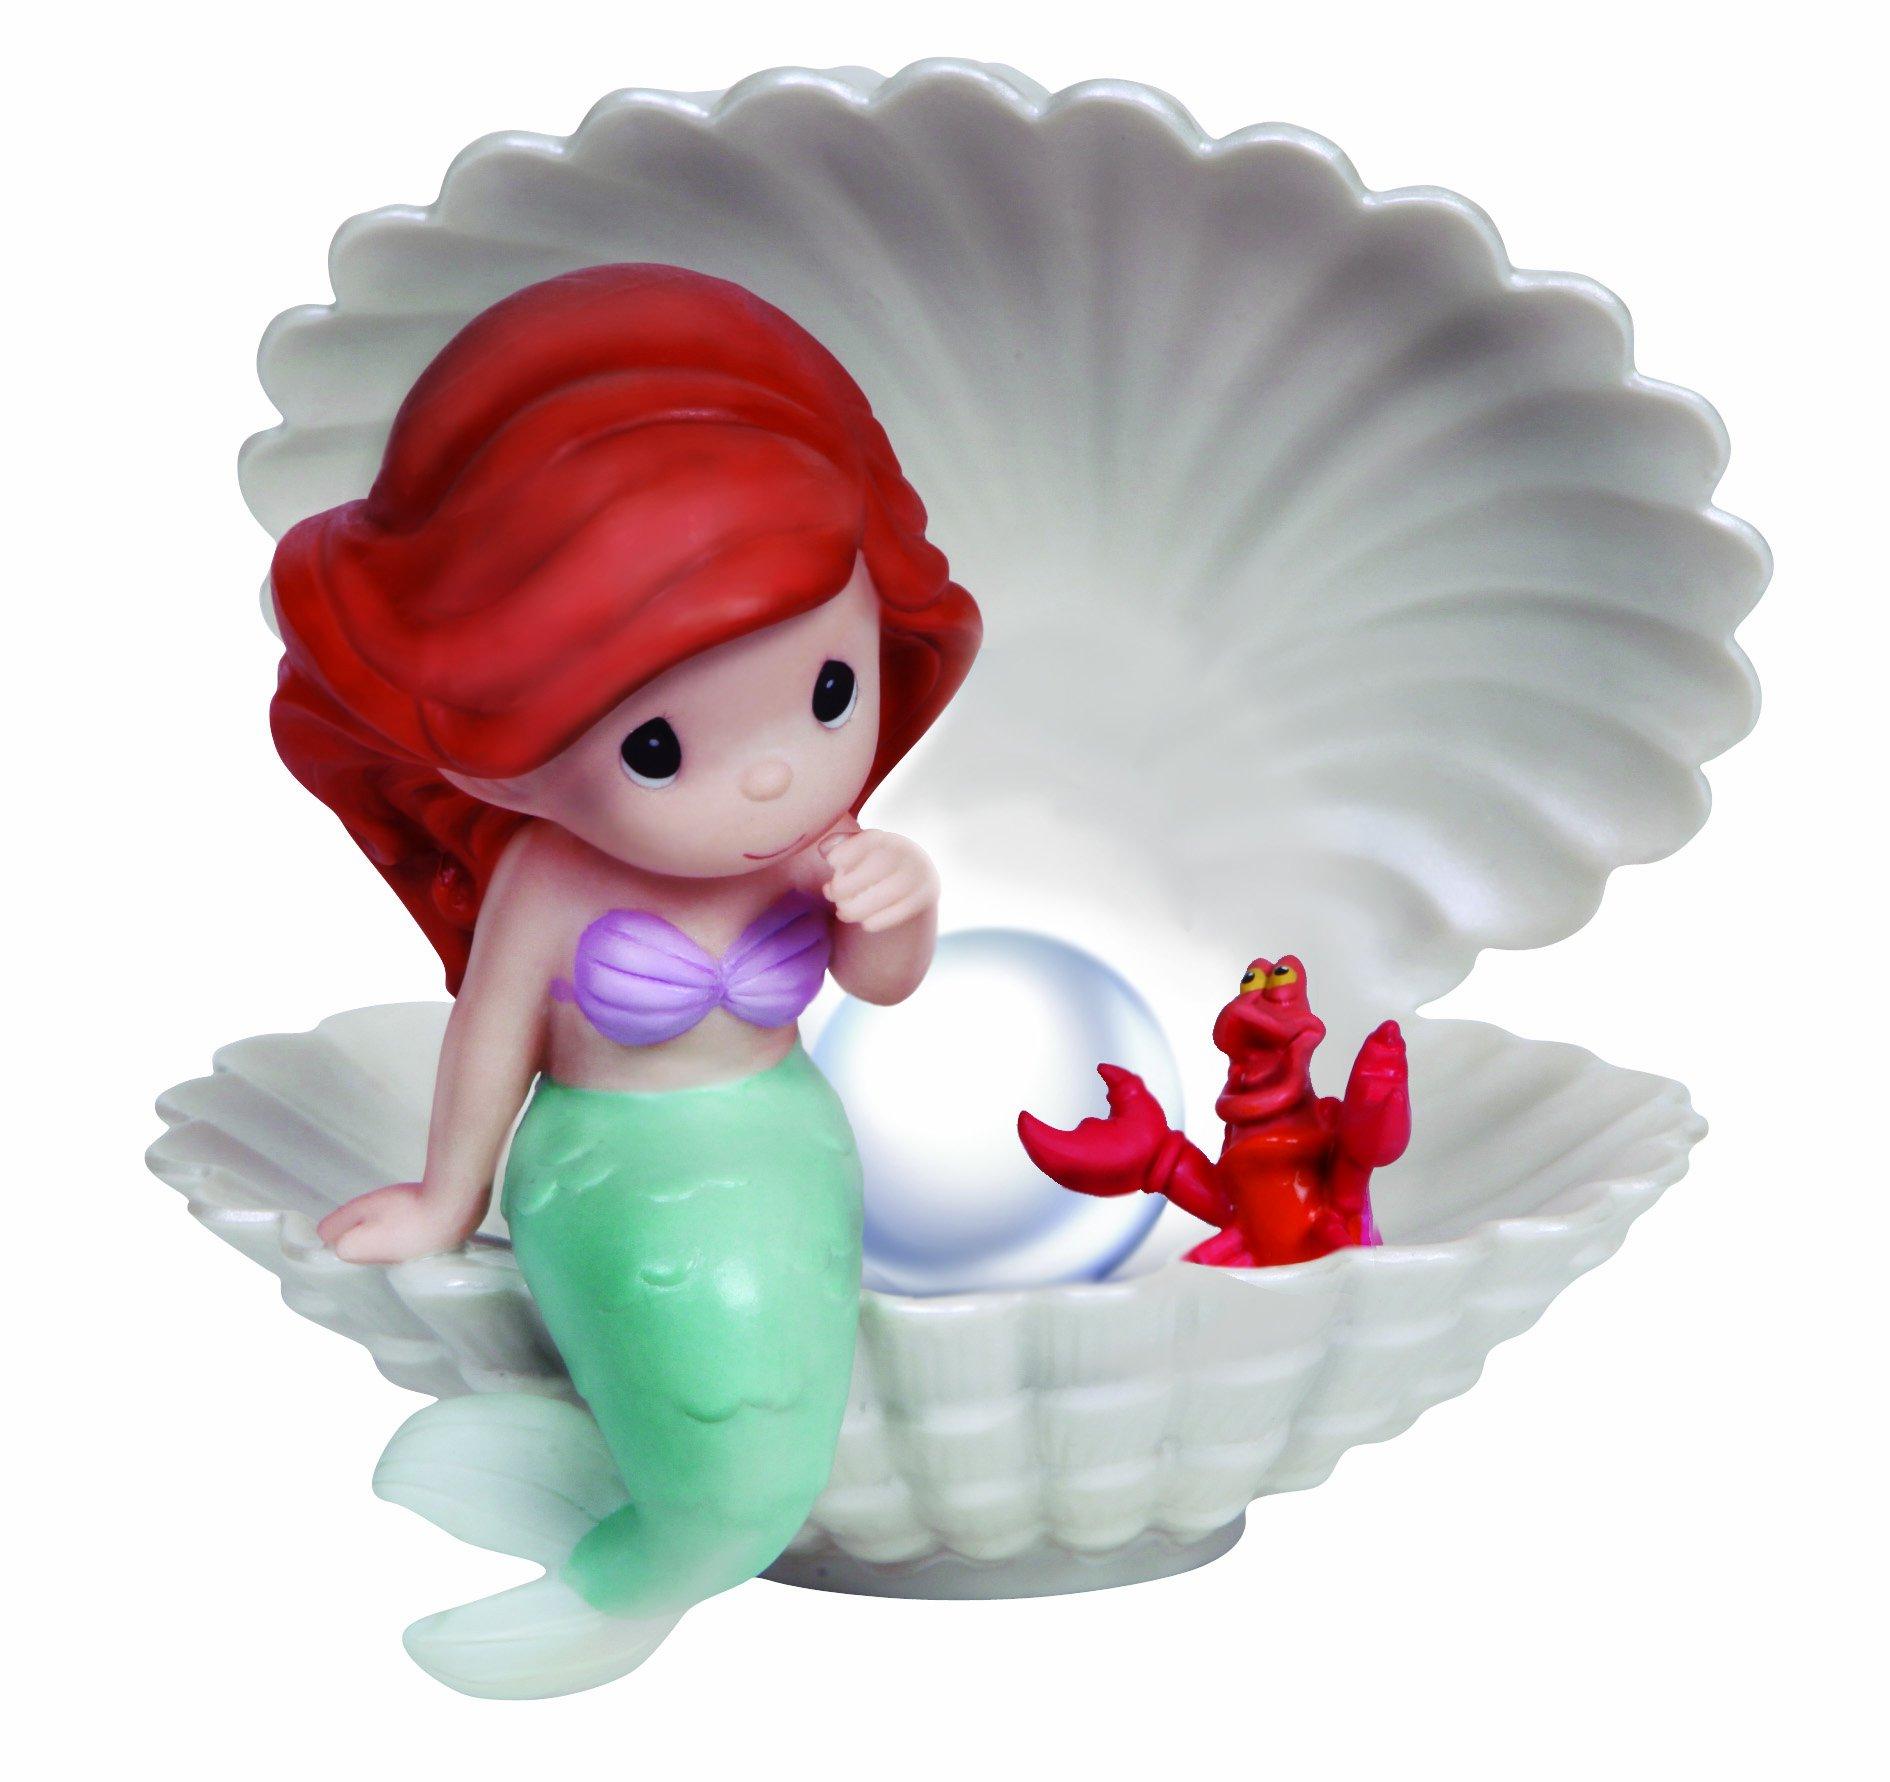 Precious Moments, Disney Showcase Collection, You're A Precious Jewel To Cherish Forever, Bisque Porcelain Figurine, 134007